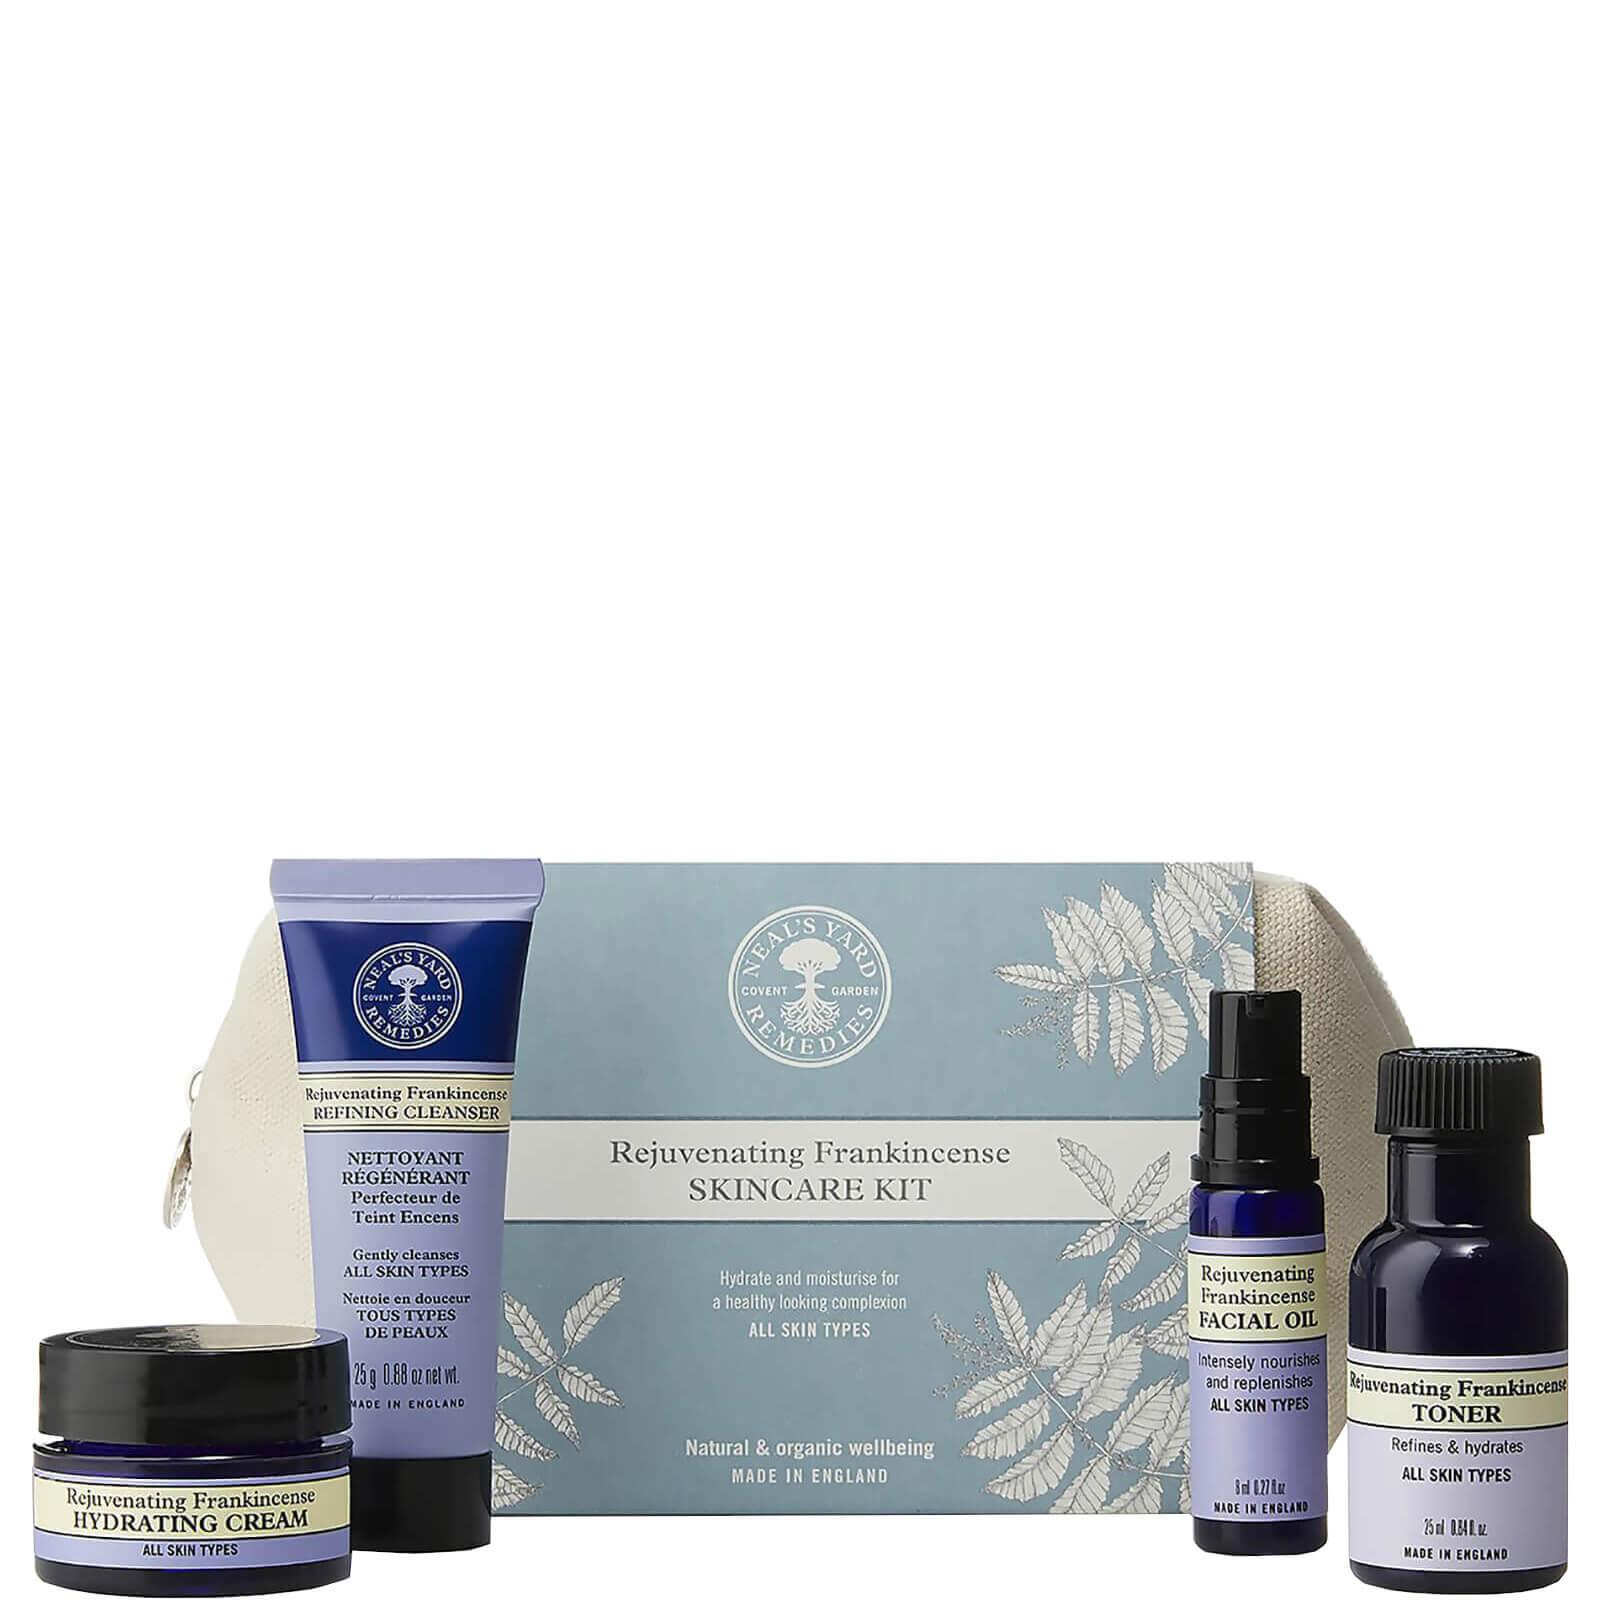 Neal's Yard Remedies Rejuvenating Frankincense Skincare Kit